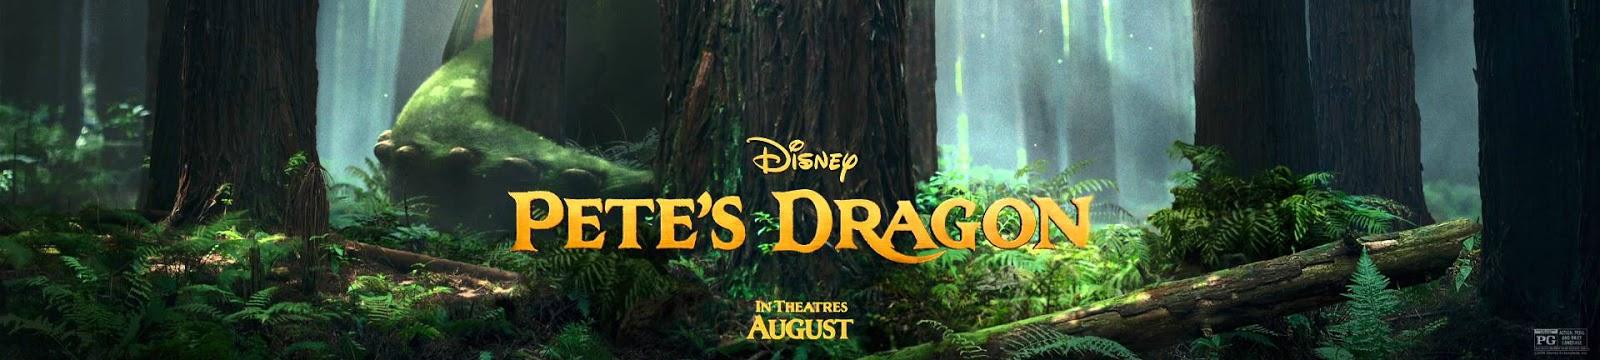 Pete's Dragon (2016) Banner